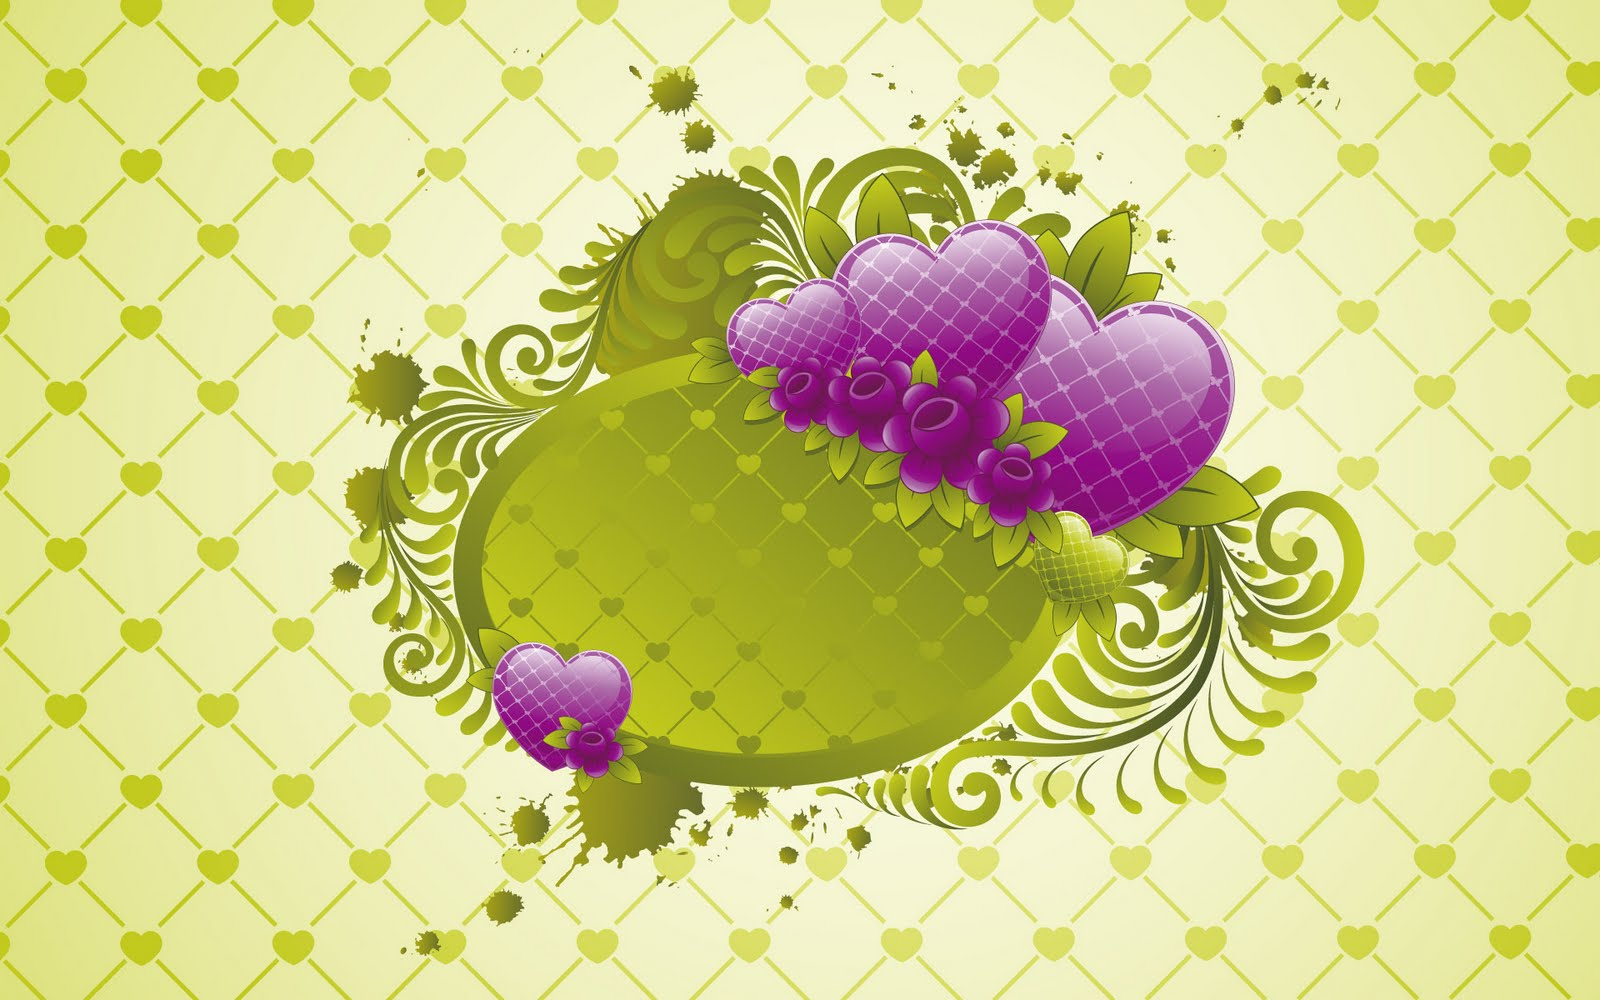 http://3.bp.blogspot.com/-pkOxyw3DZfA/TVacqml0lFI/AAAAAAAAFWQ/DMZoB39tDSo/s1600/valentines-day-wallpaper-5Final-Fantasy-HD-Wallpaper-1Salma_Hayek-sophie-choudhary-Alessandra-Ambrosio-Adriana%2BLim-emma-roberts-Love-wallpapers-romantic-hermione-granger-emma-watson.jpg